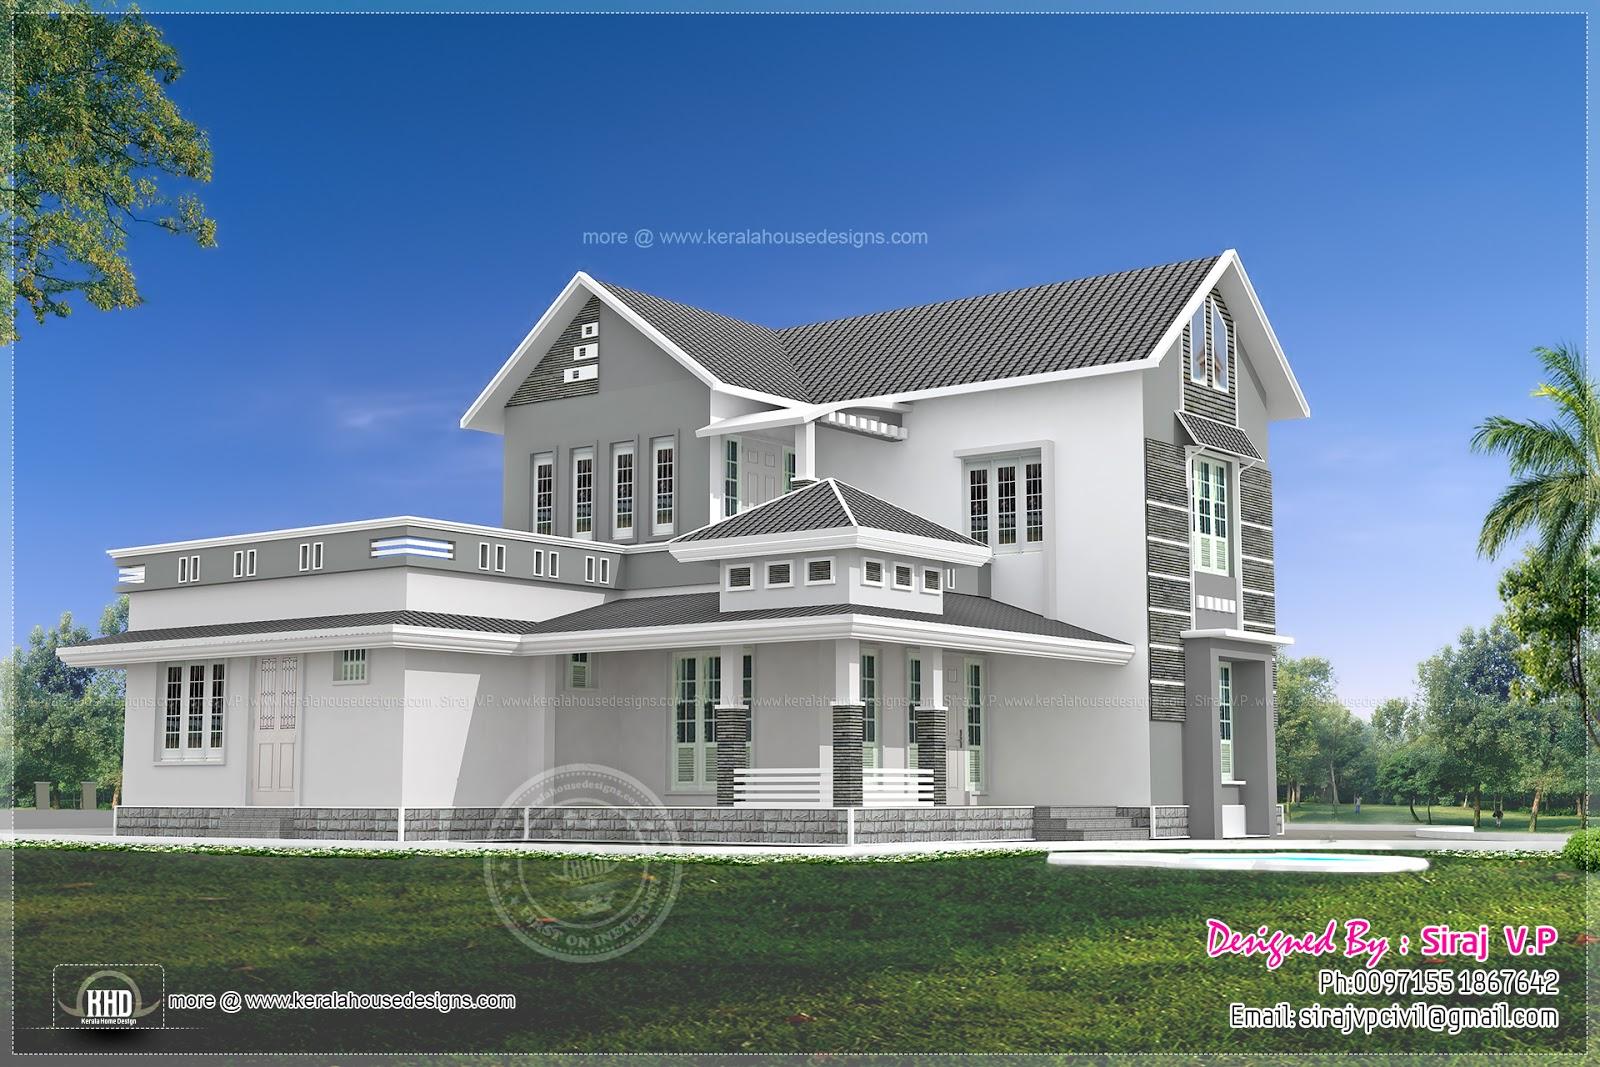 Beautiful 4 bedroom villa elevation in 2000 sq ft kerala home design and floor plans - Beautiful houses plan with bedroom ...